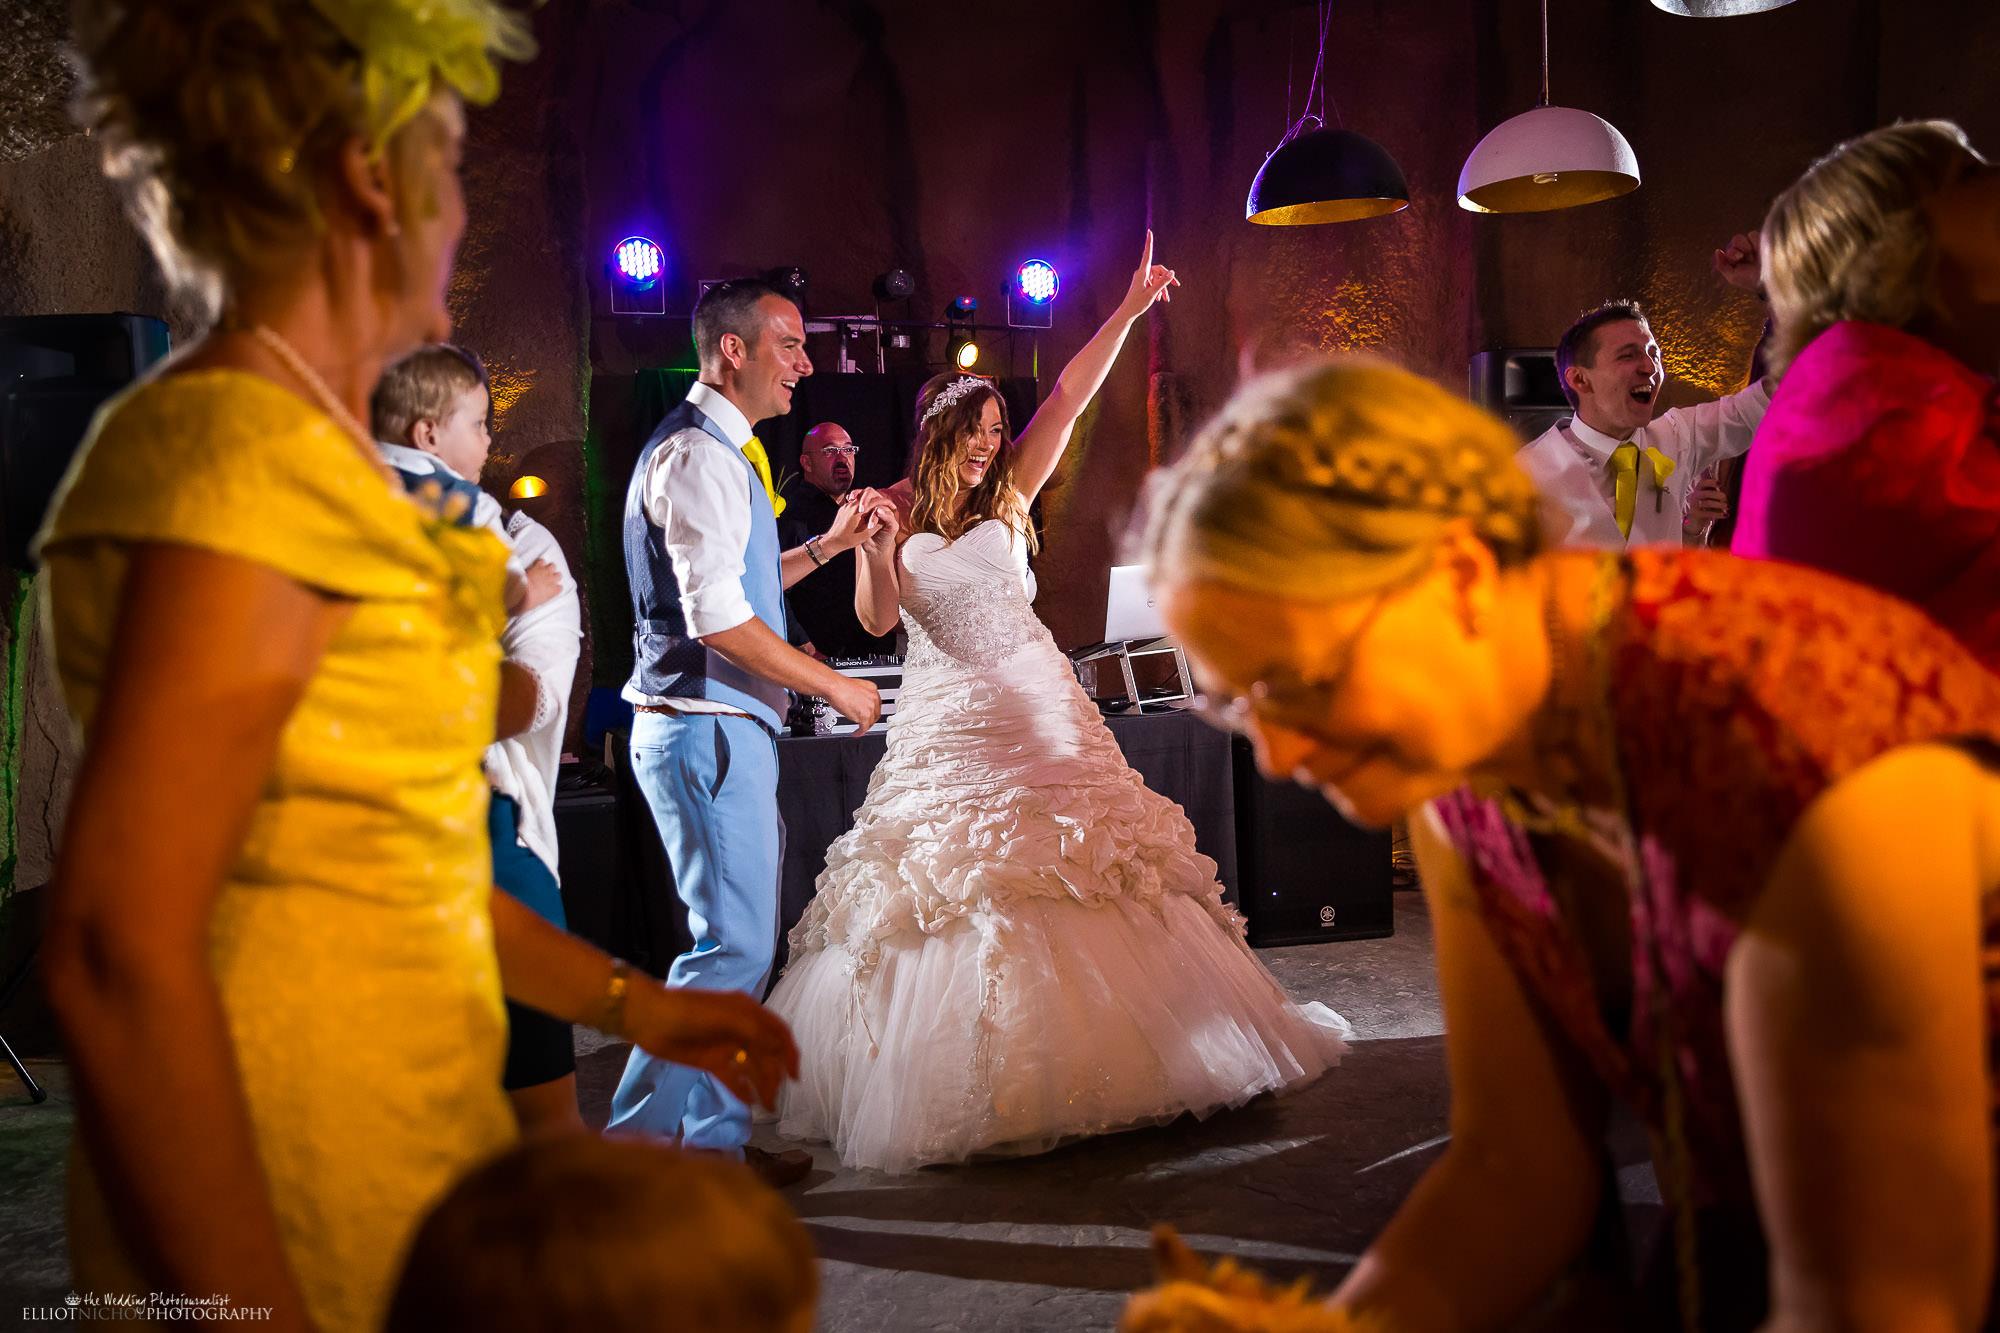 fun-wedding-photography-destination-weddings-North-East